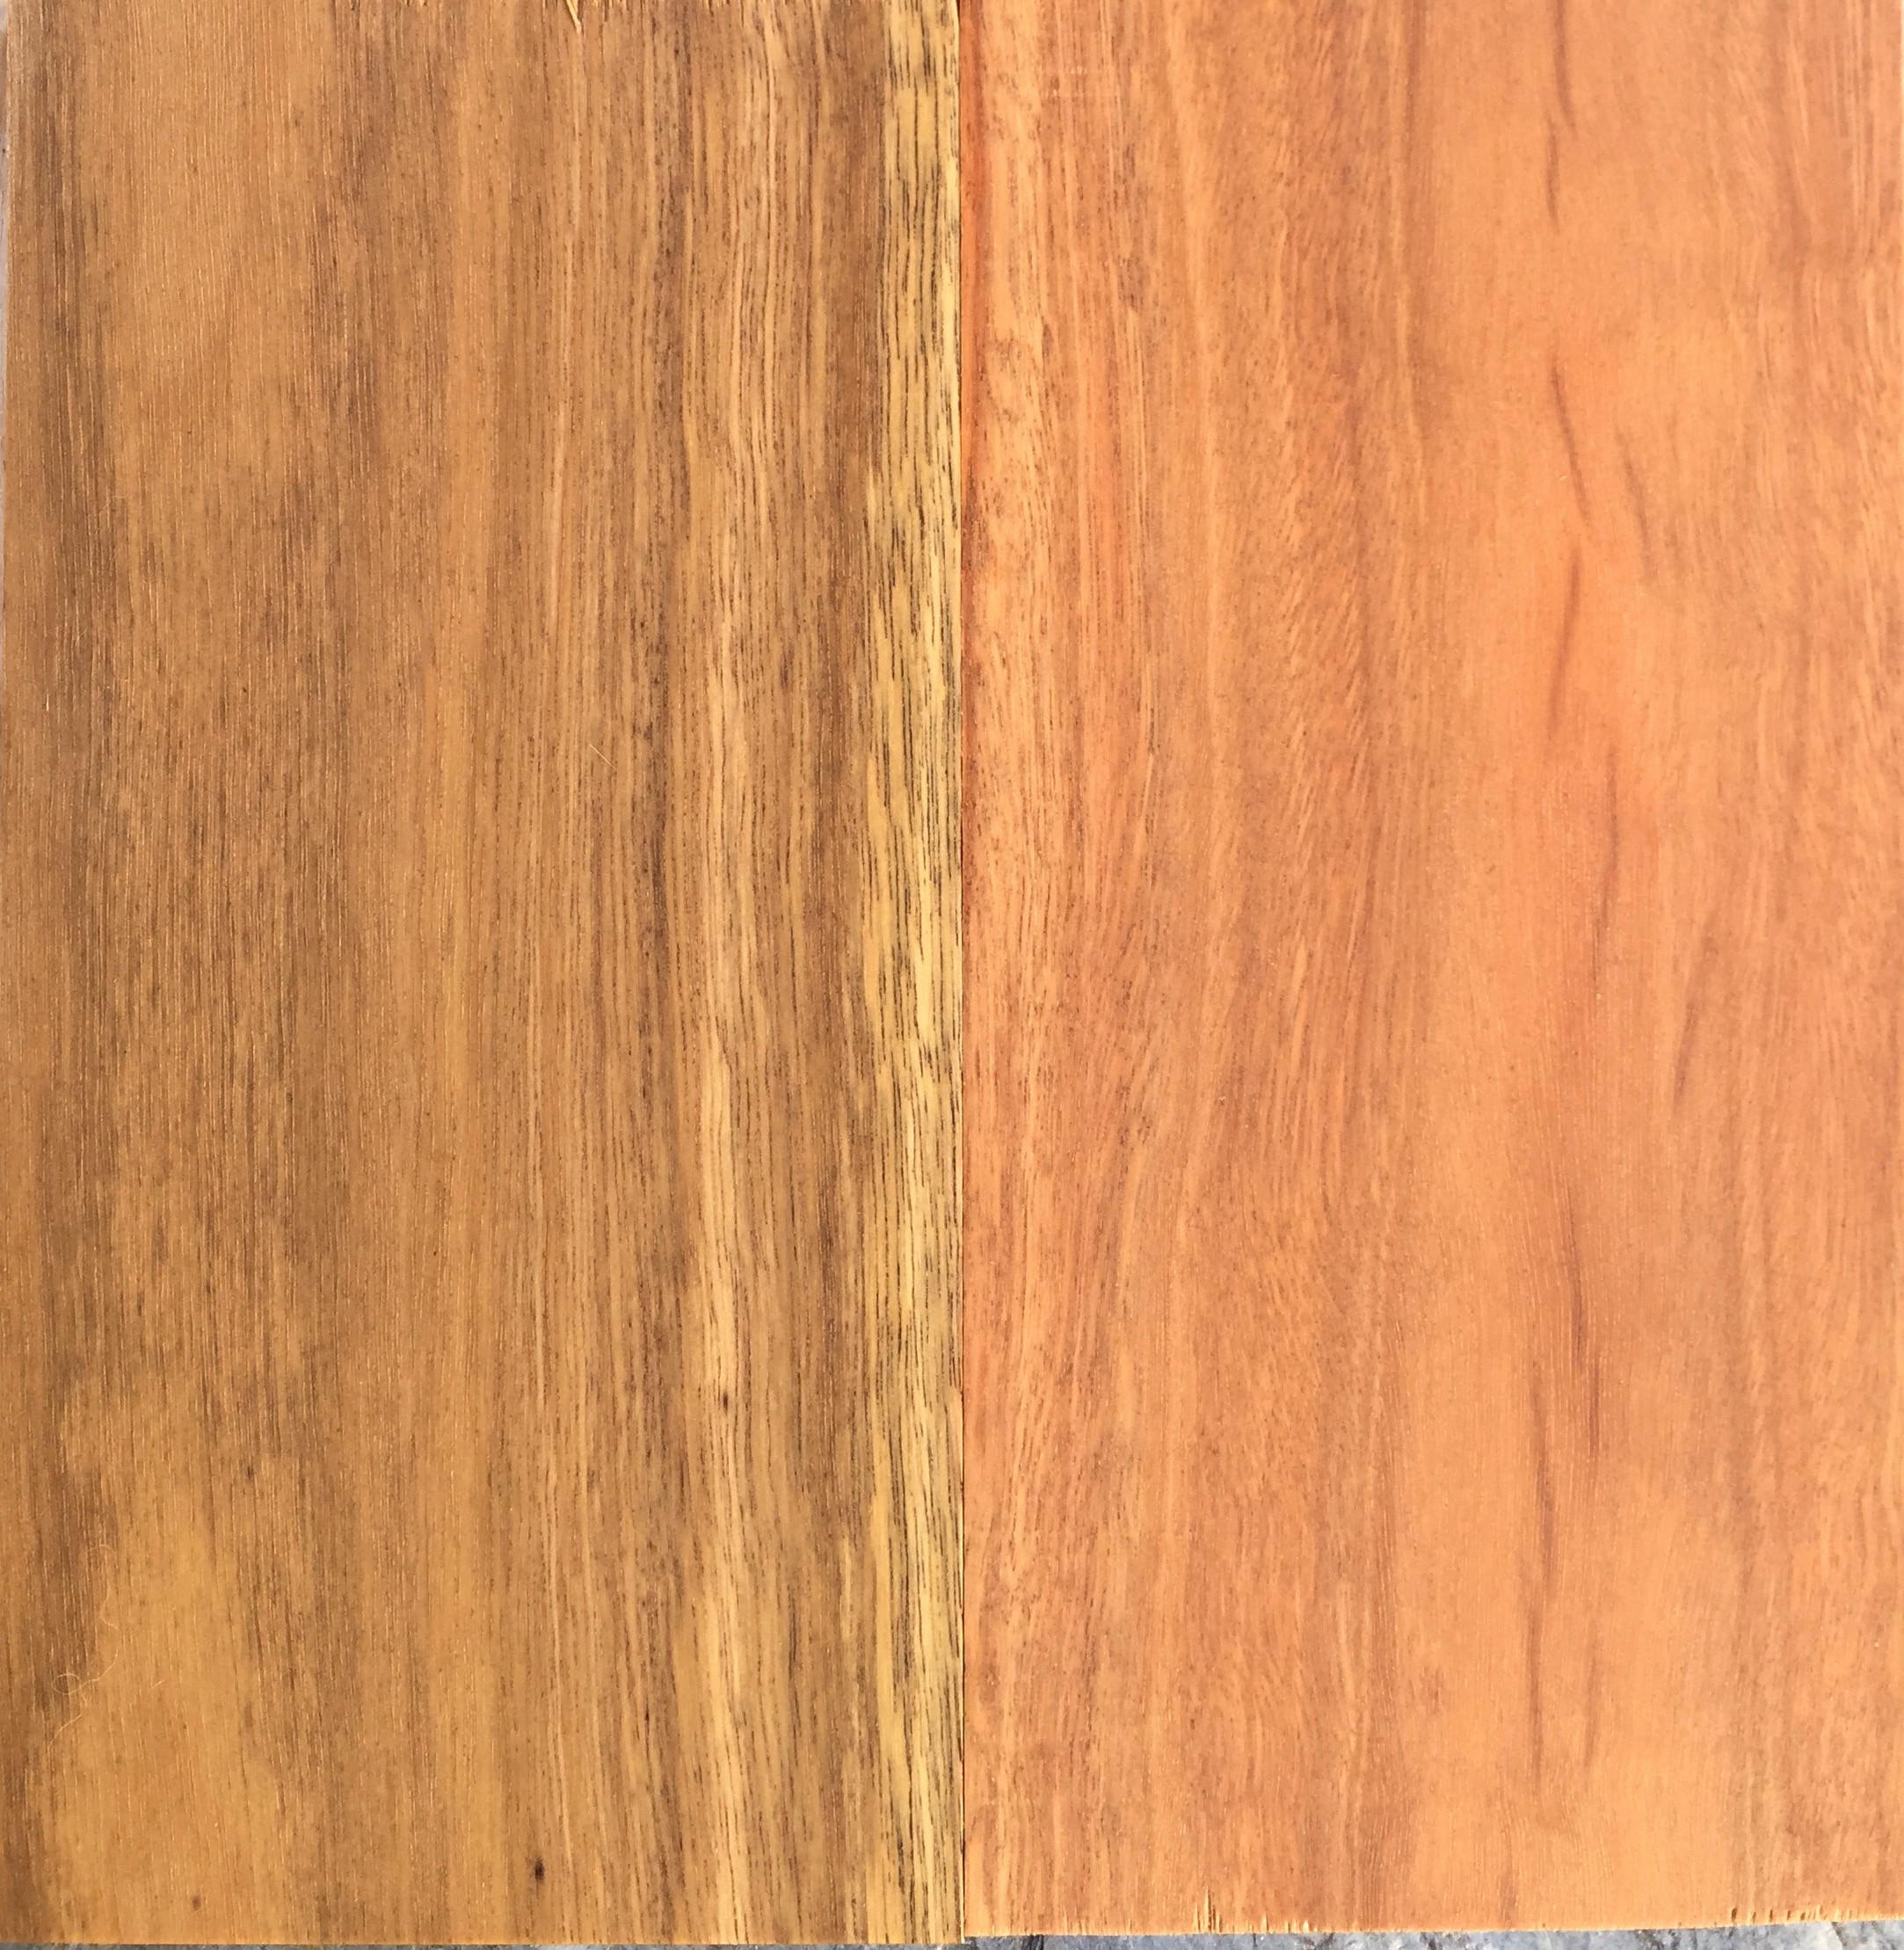 hardwood floor care of cleaning hardwood floors with vinegar hardwood floor cleaning wood throughout cleaning hardwood floors with vinegar 50 best how to get wax f hardwood floors graphics 50